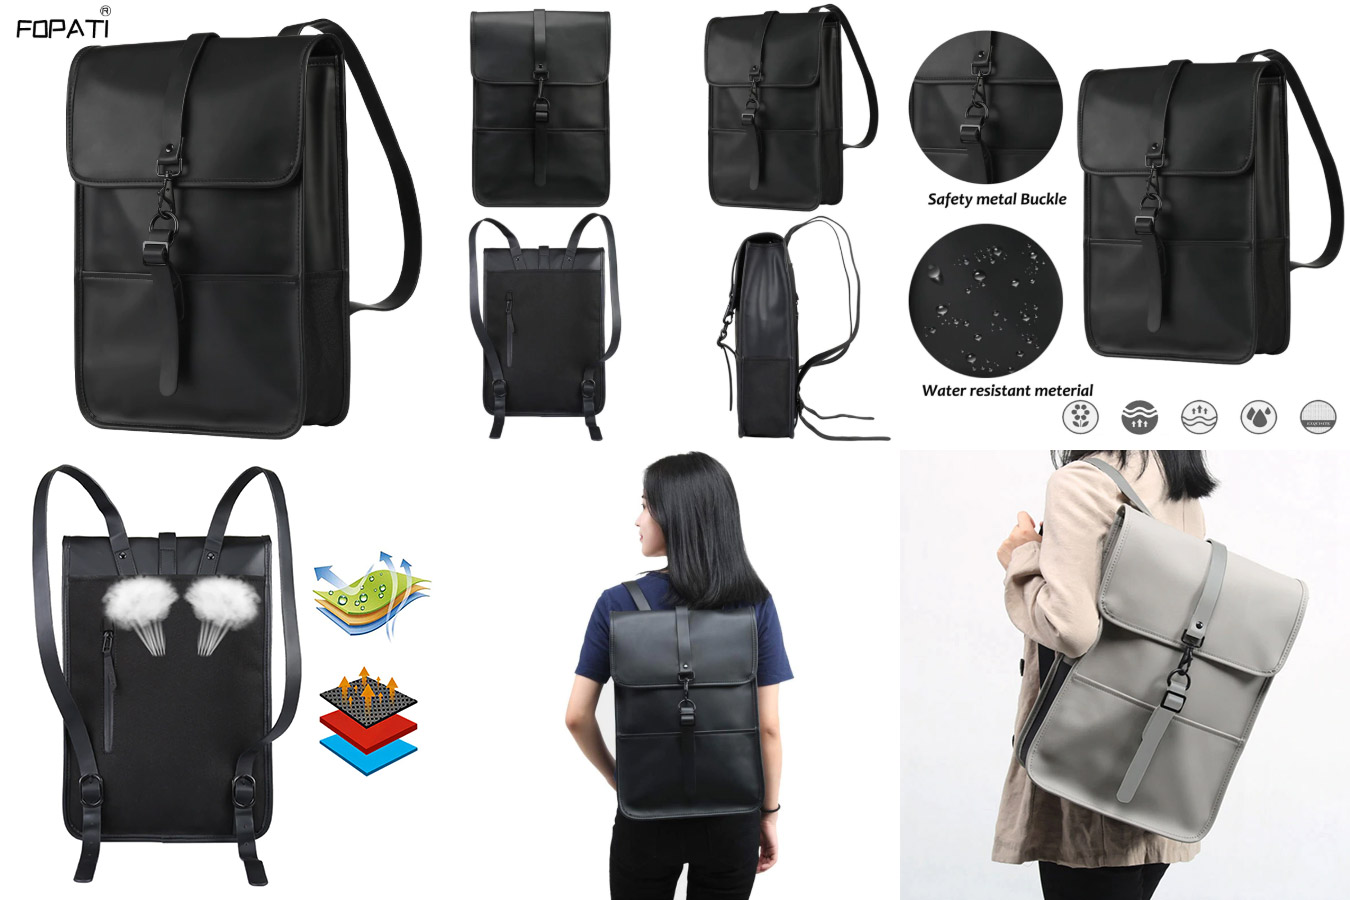 Строгая водонепроницаемая сумка-рюкзак